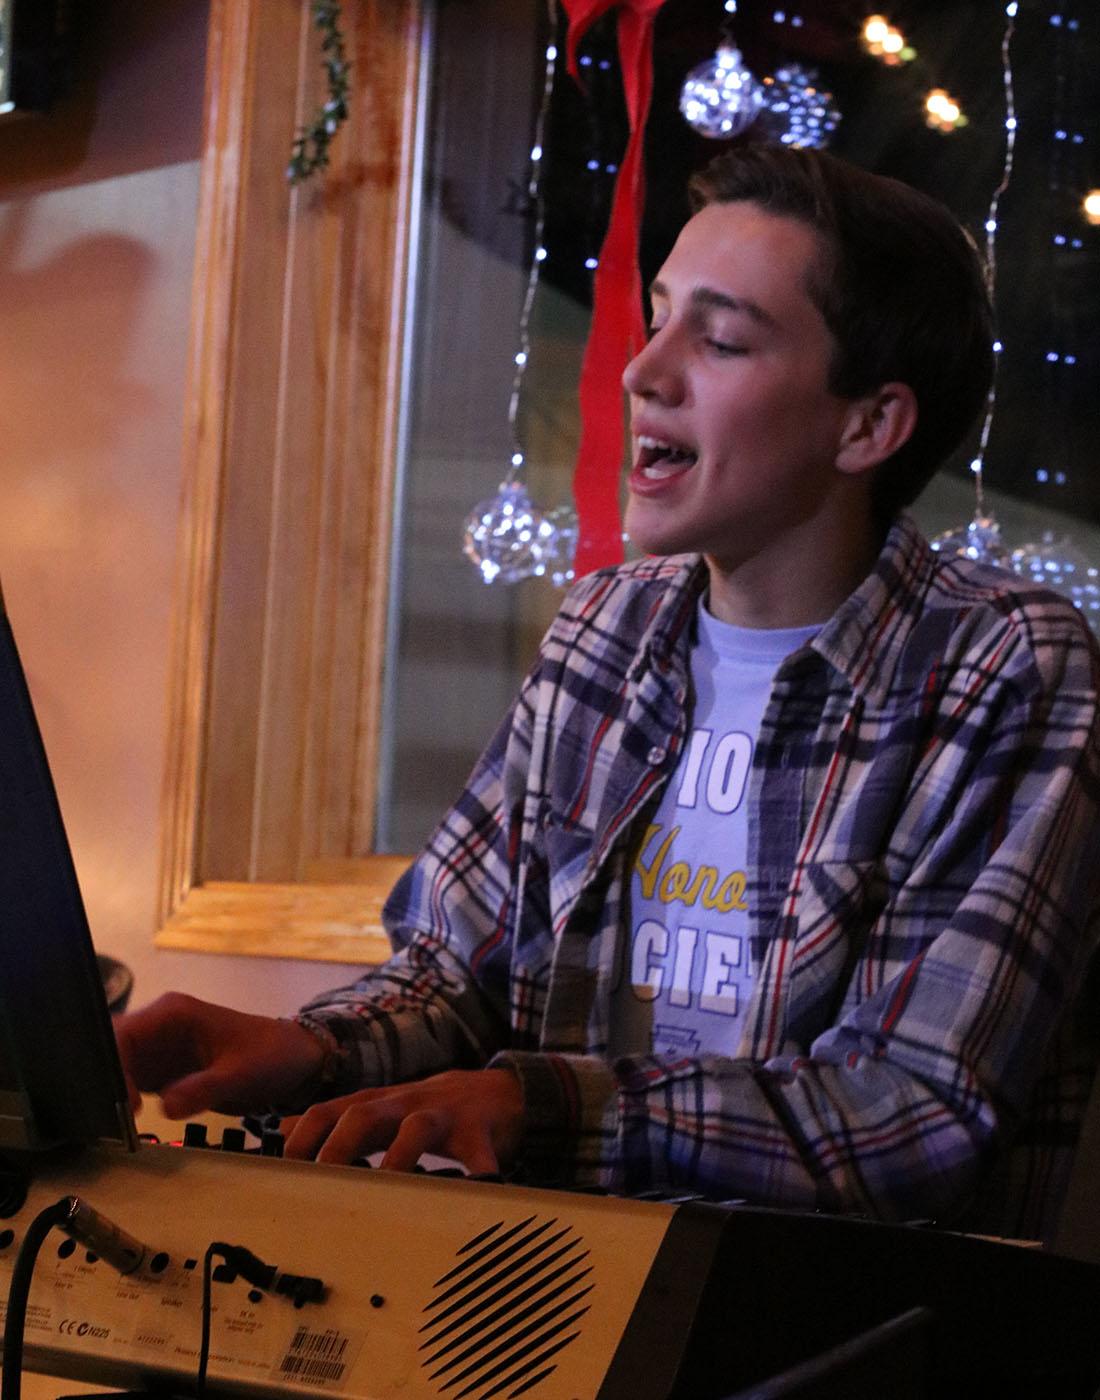 Gabriel Rysavy plays the keyboard and sings at the Art Splash